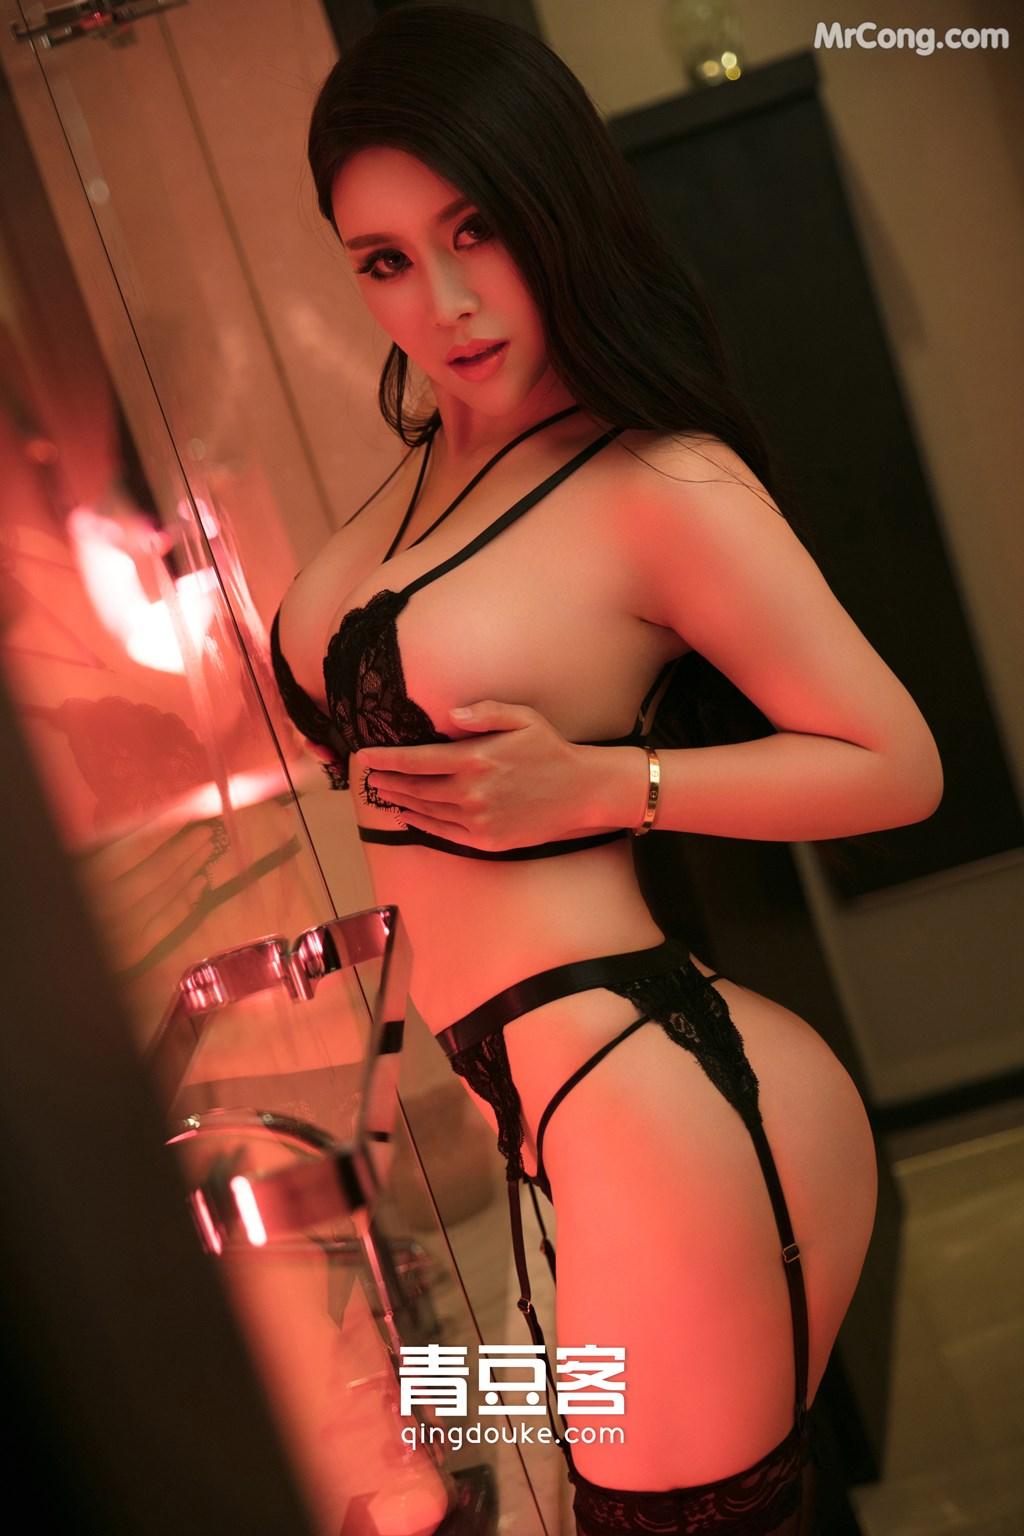 Image QingDouKe-2017-11-05-Ke-Rui-Na-MrCong.com-030 in post QingDouKe 2017-11-05: Người mẫu Ke Rui Na (可蕊娜) (48 ảnh)